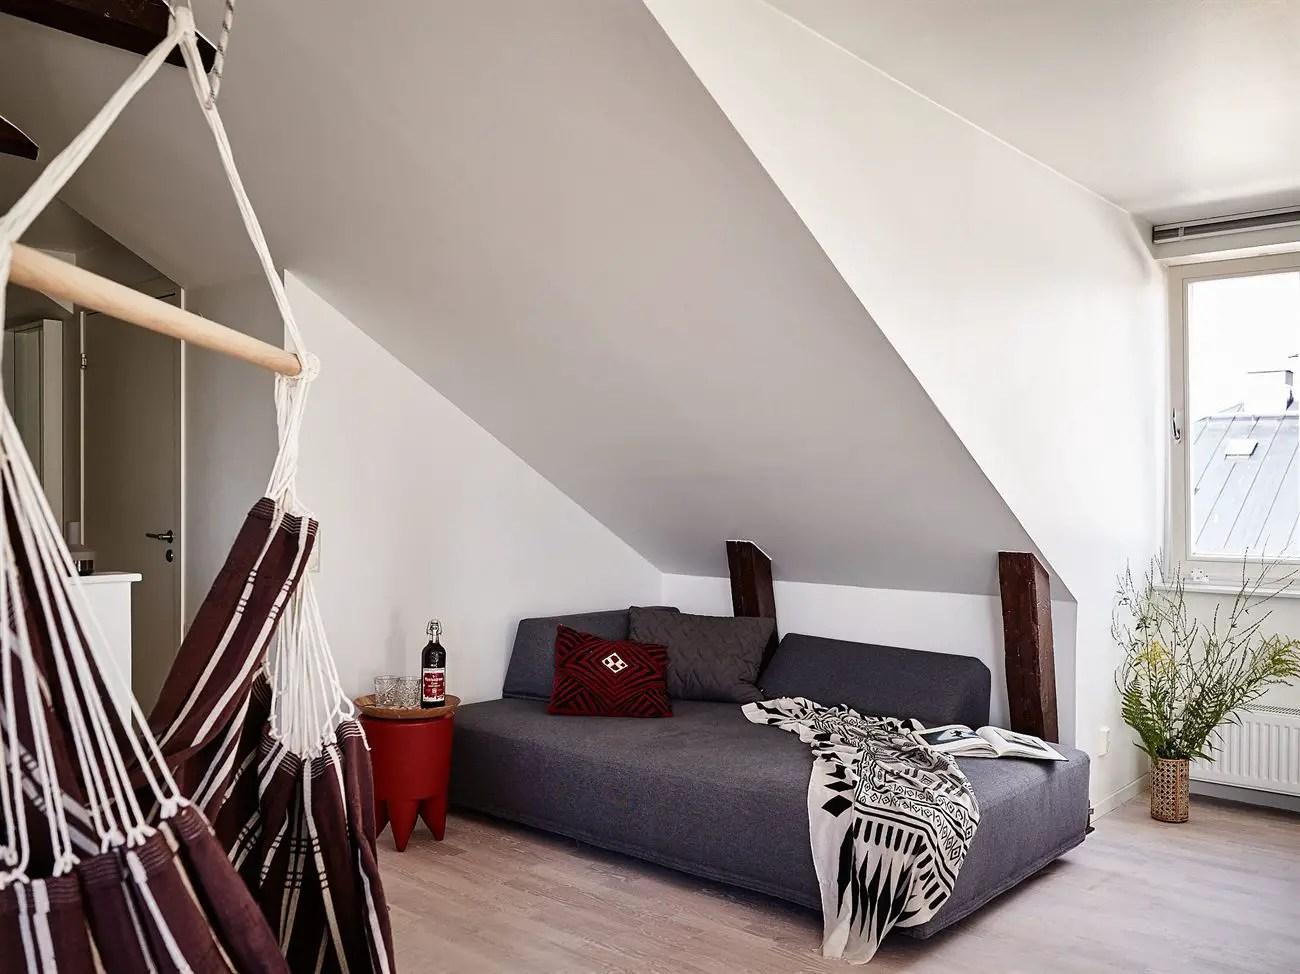 une histoire de hamac planete deco a homes world. Black Bedroom Furniture Sets. Home Design Ideas